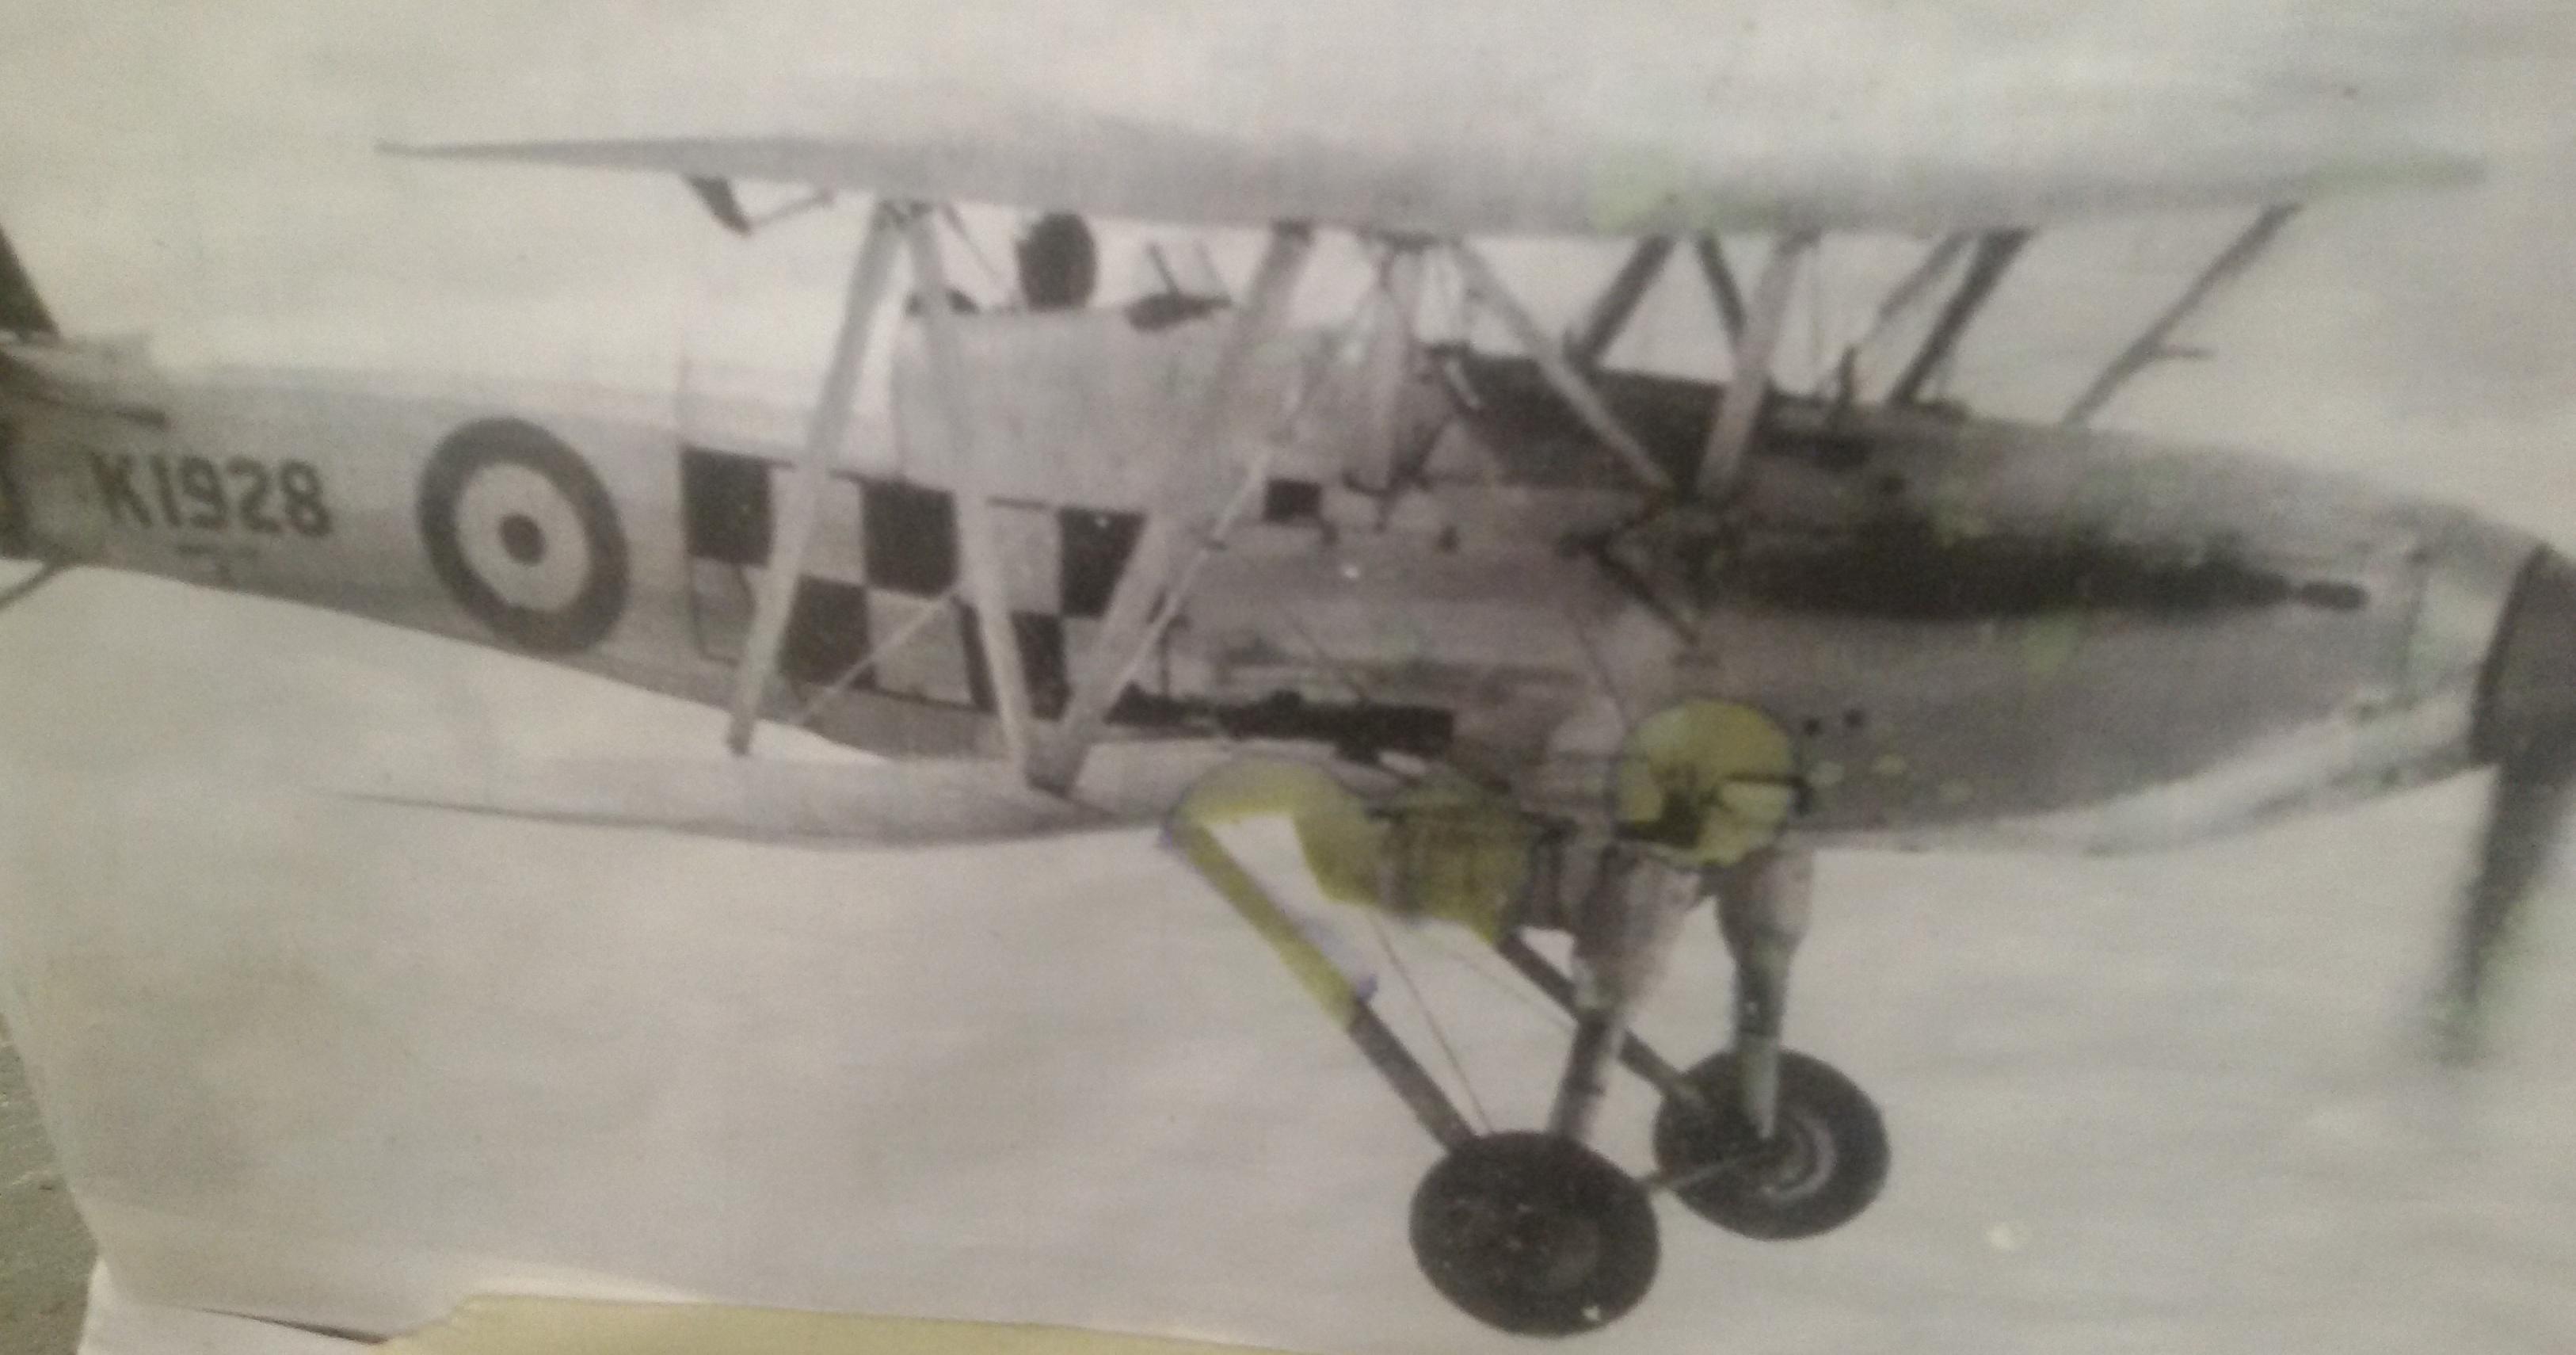 Fury K1928